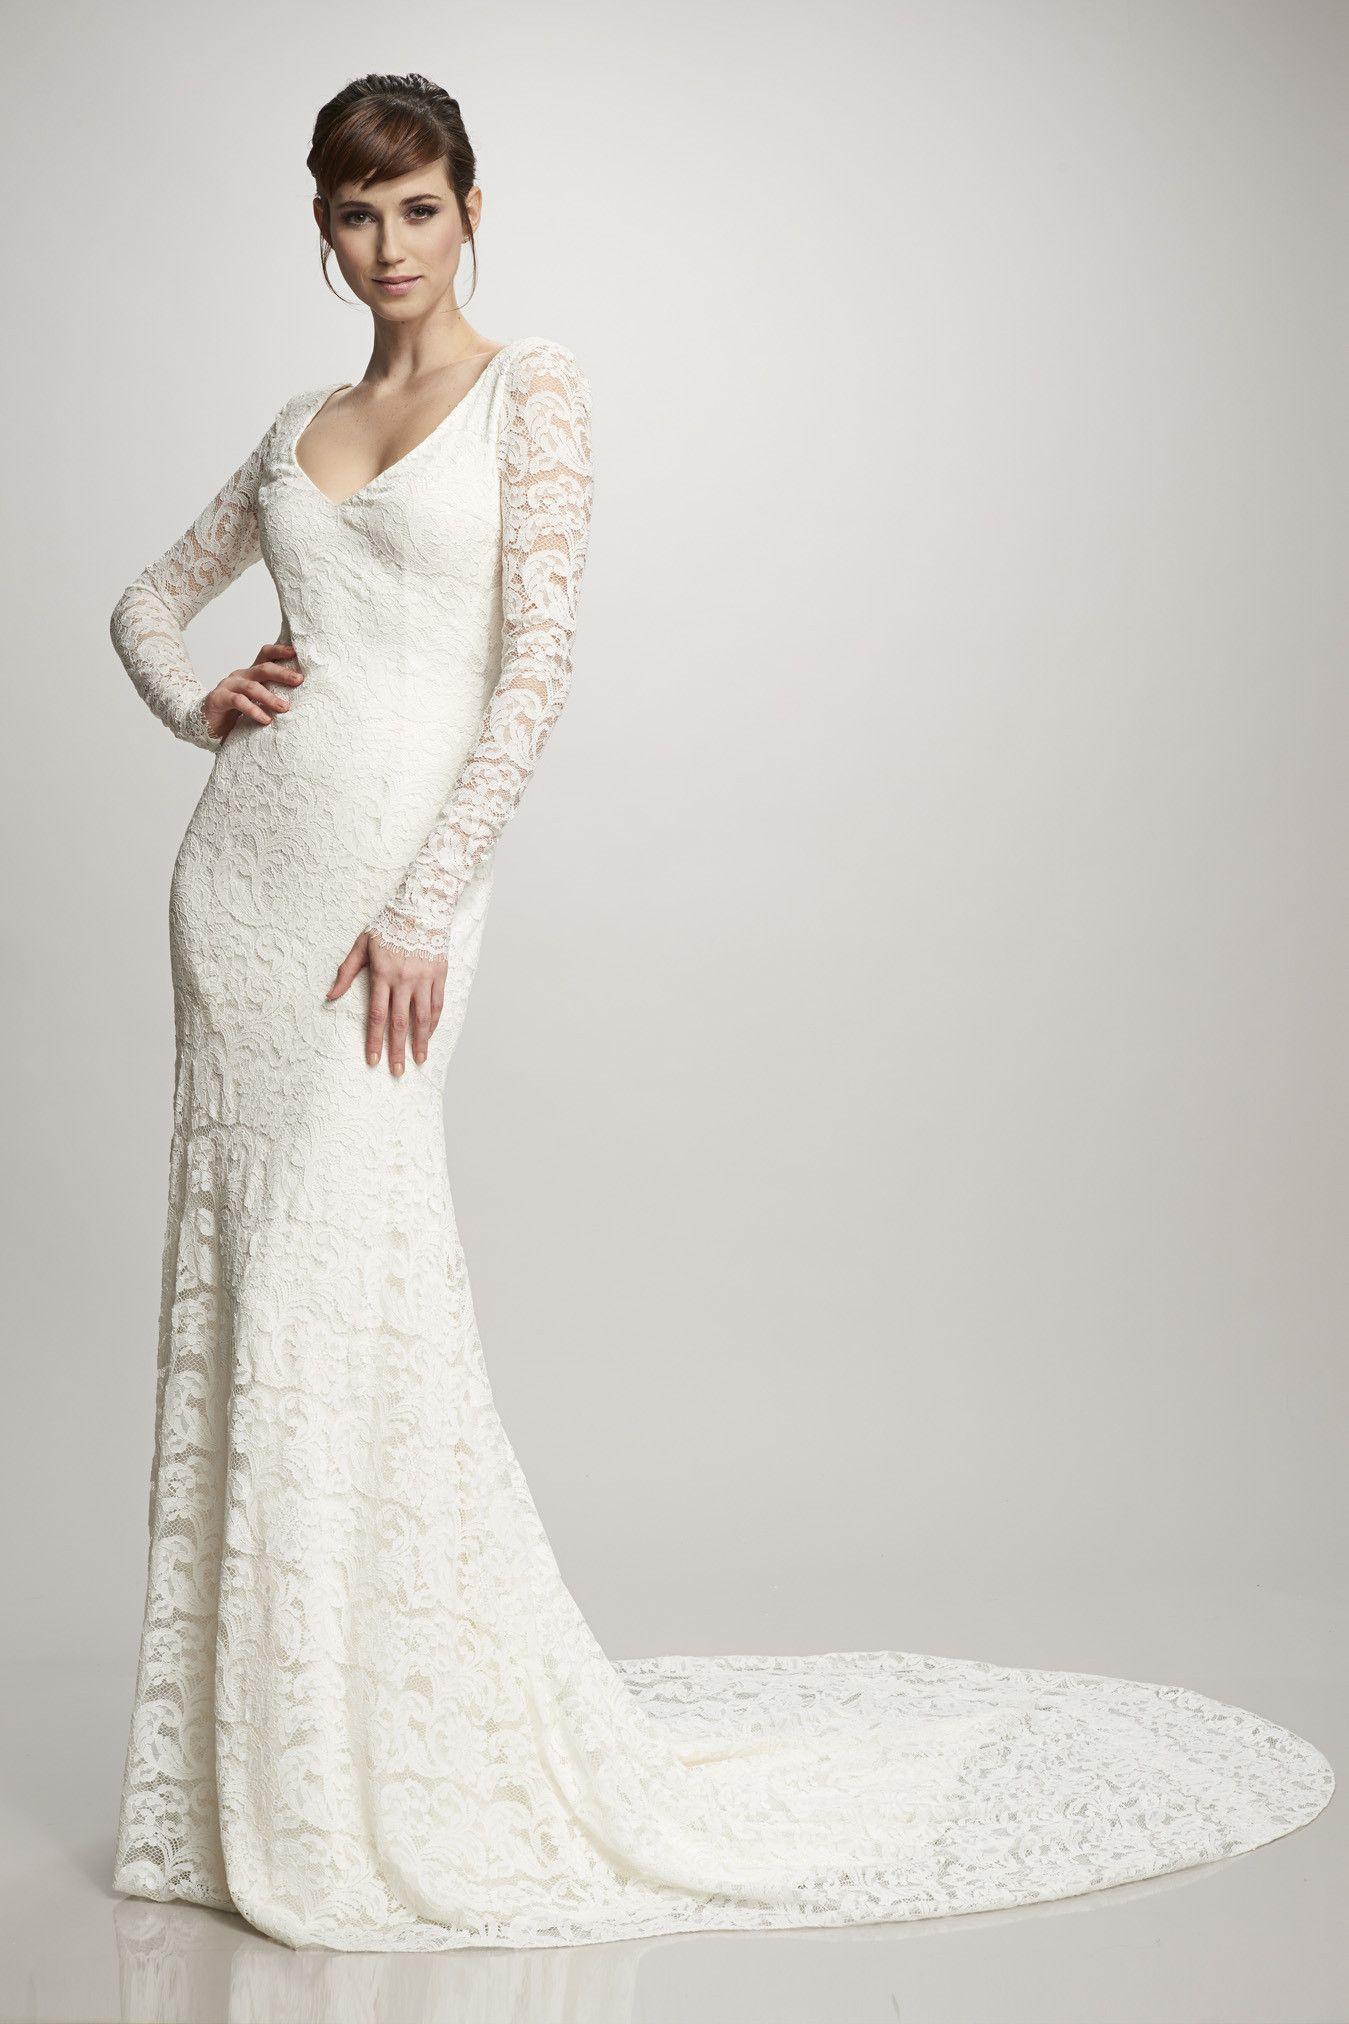 Theia nicole ellies bridal boutique alexandria va designer theia nicole ellies bridal boutique alexandria junglespirit Choice Image